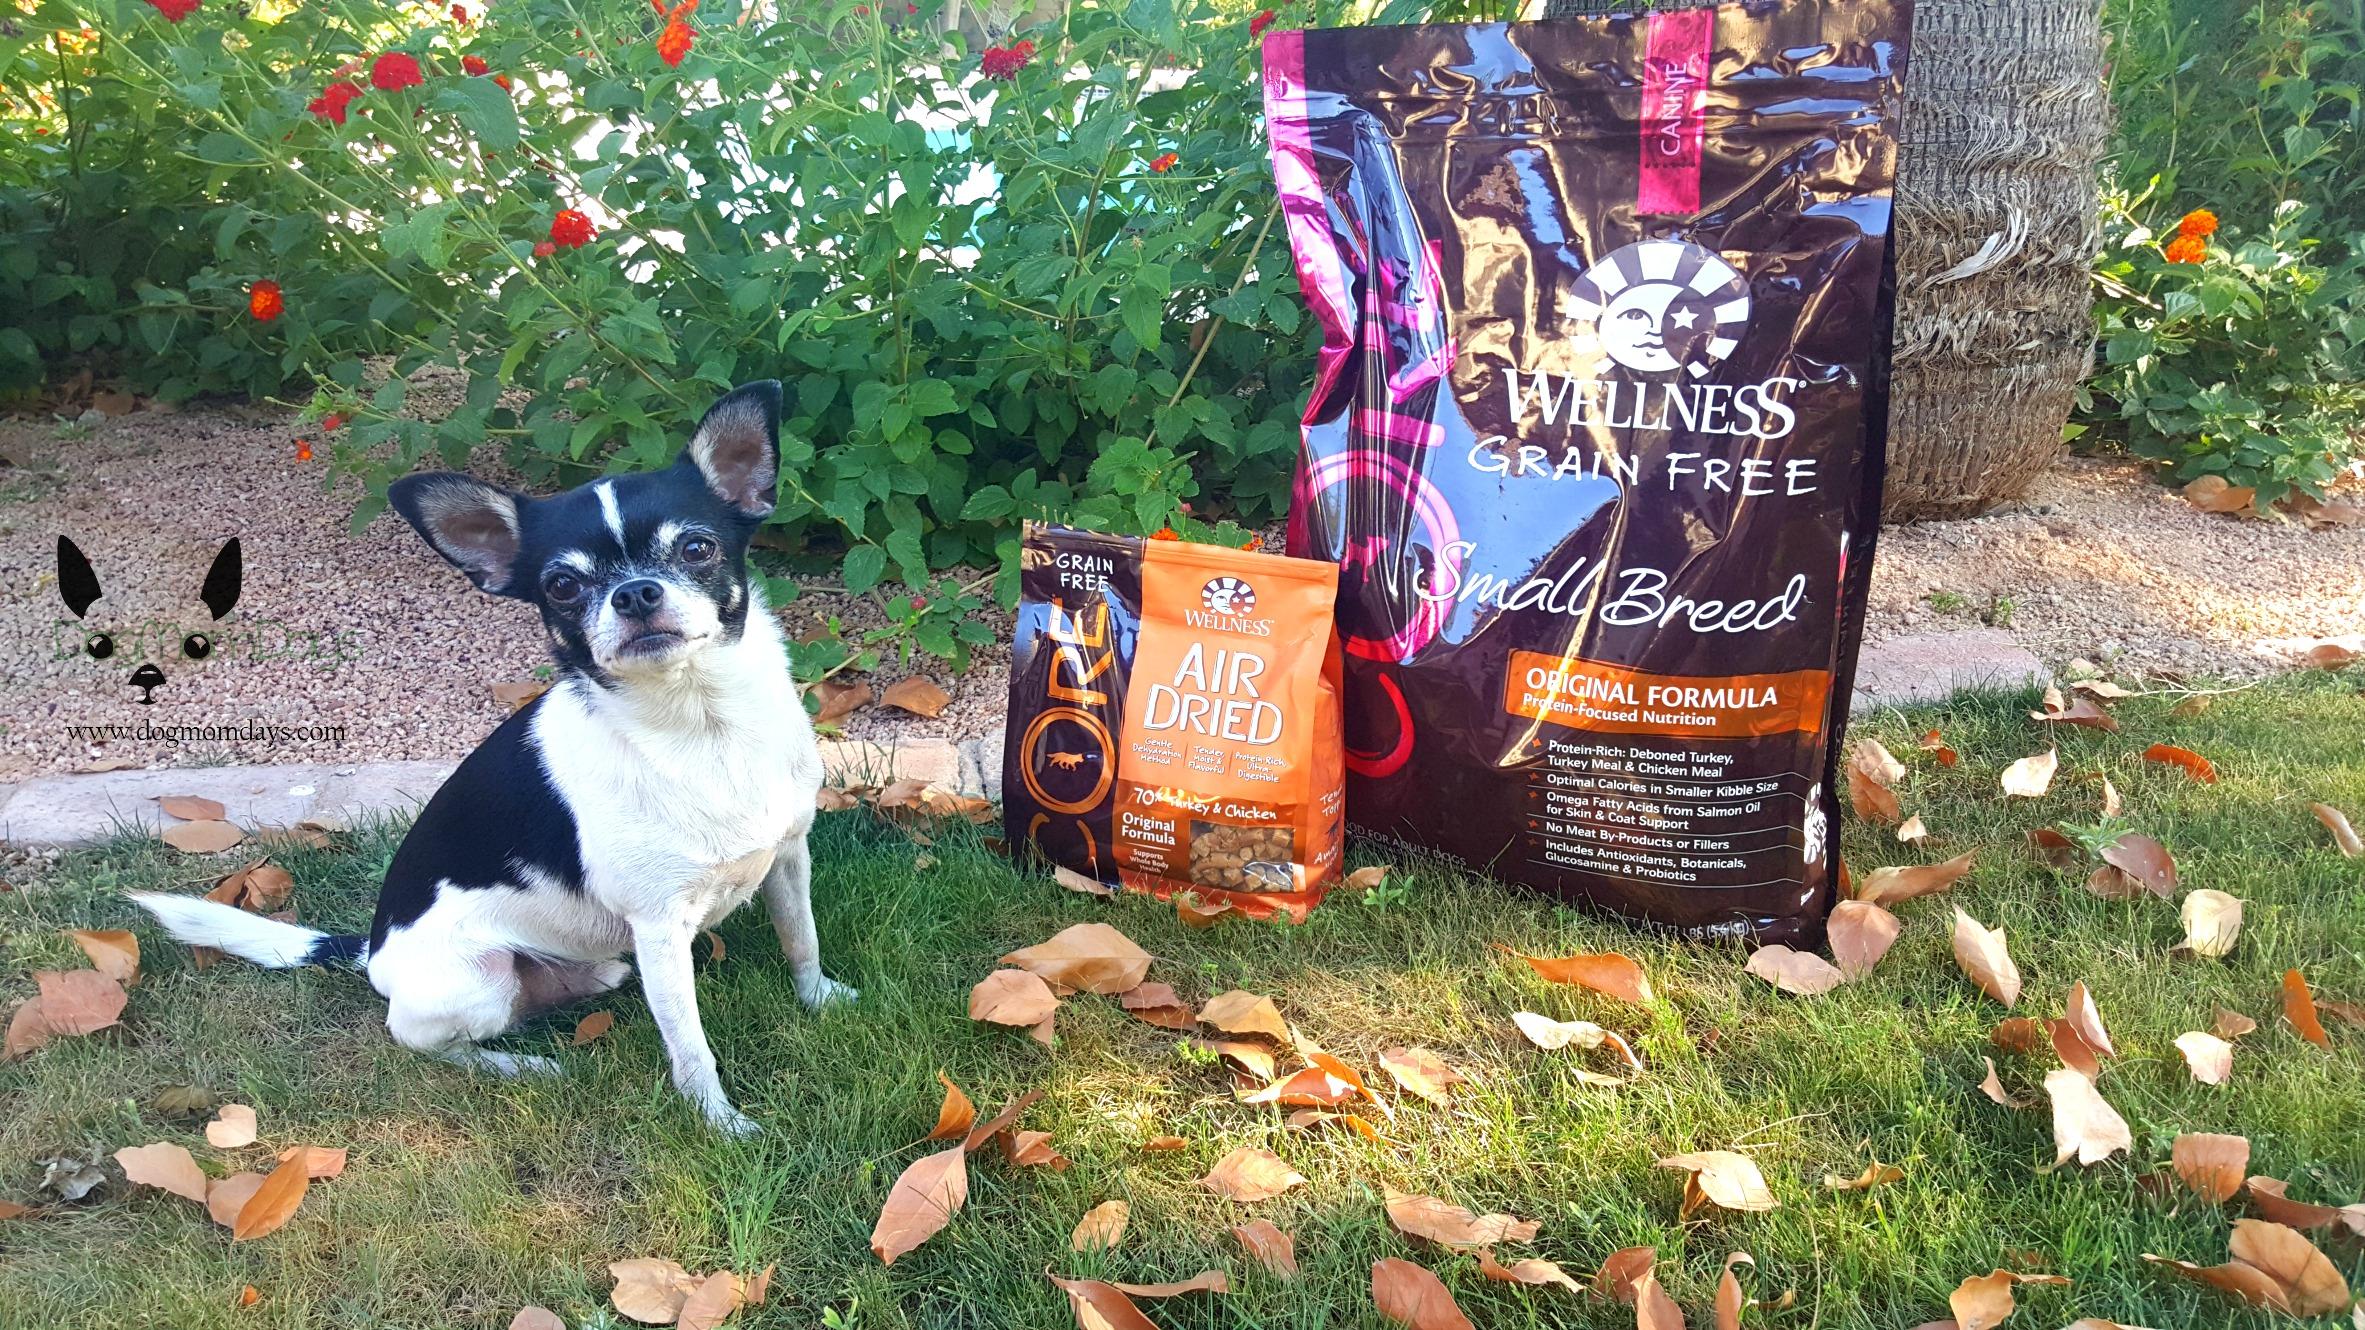 Wellness grain-free dog food